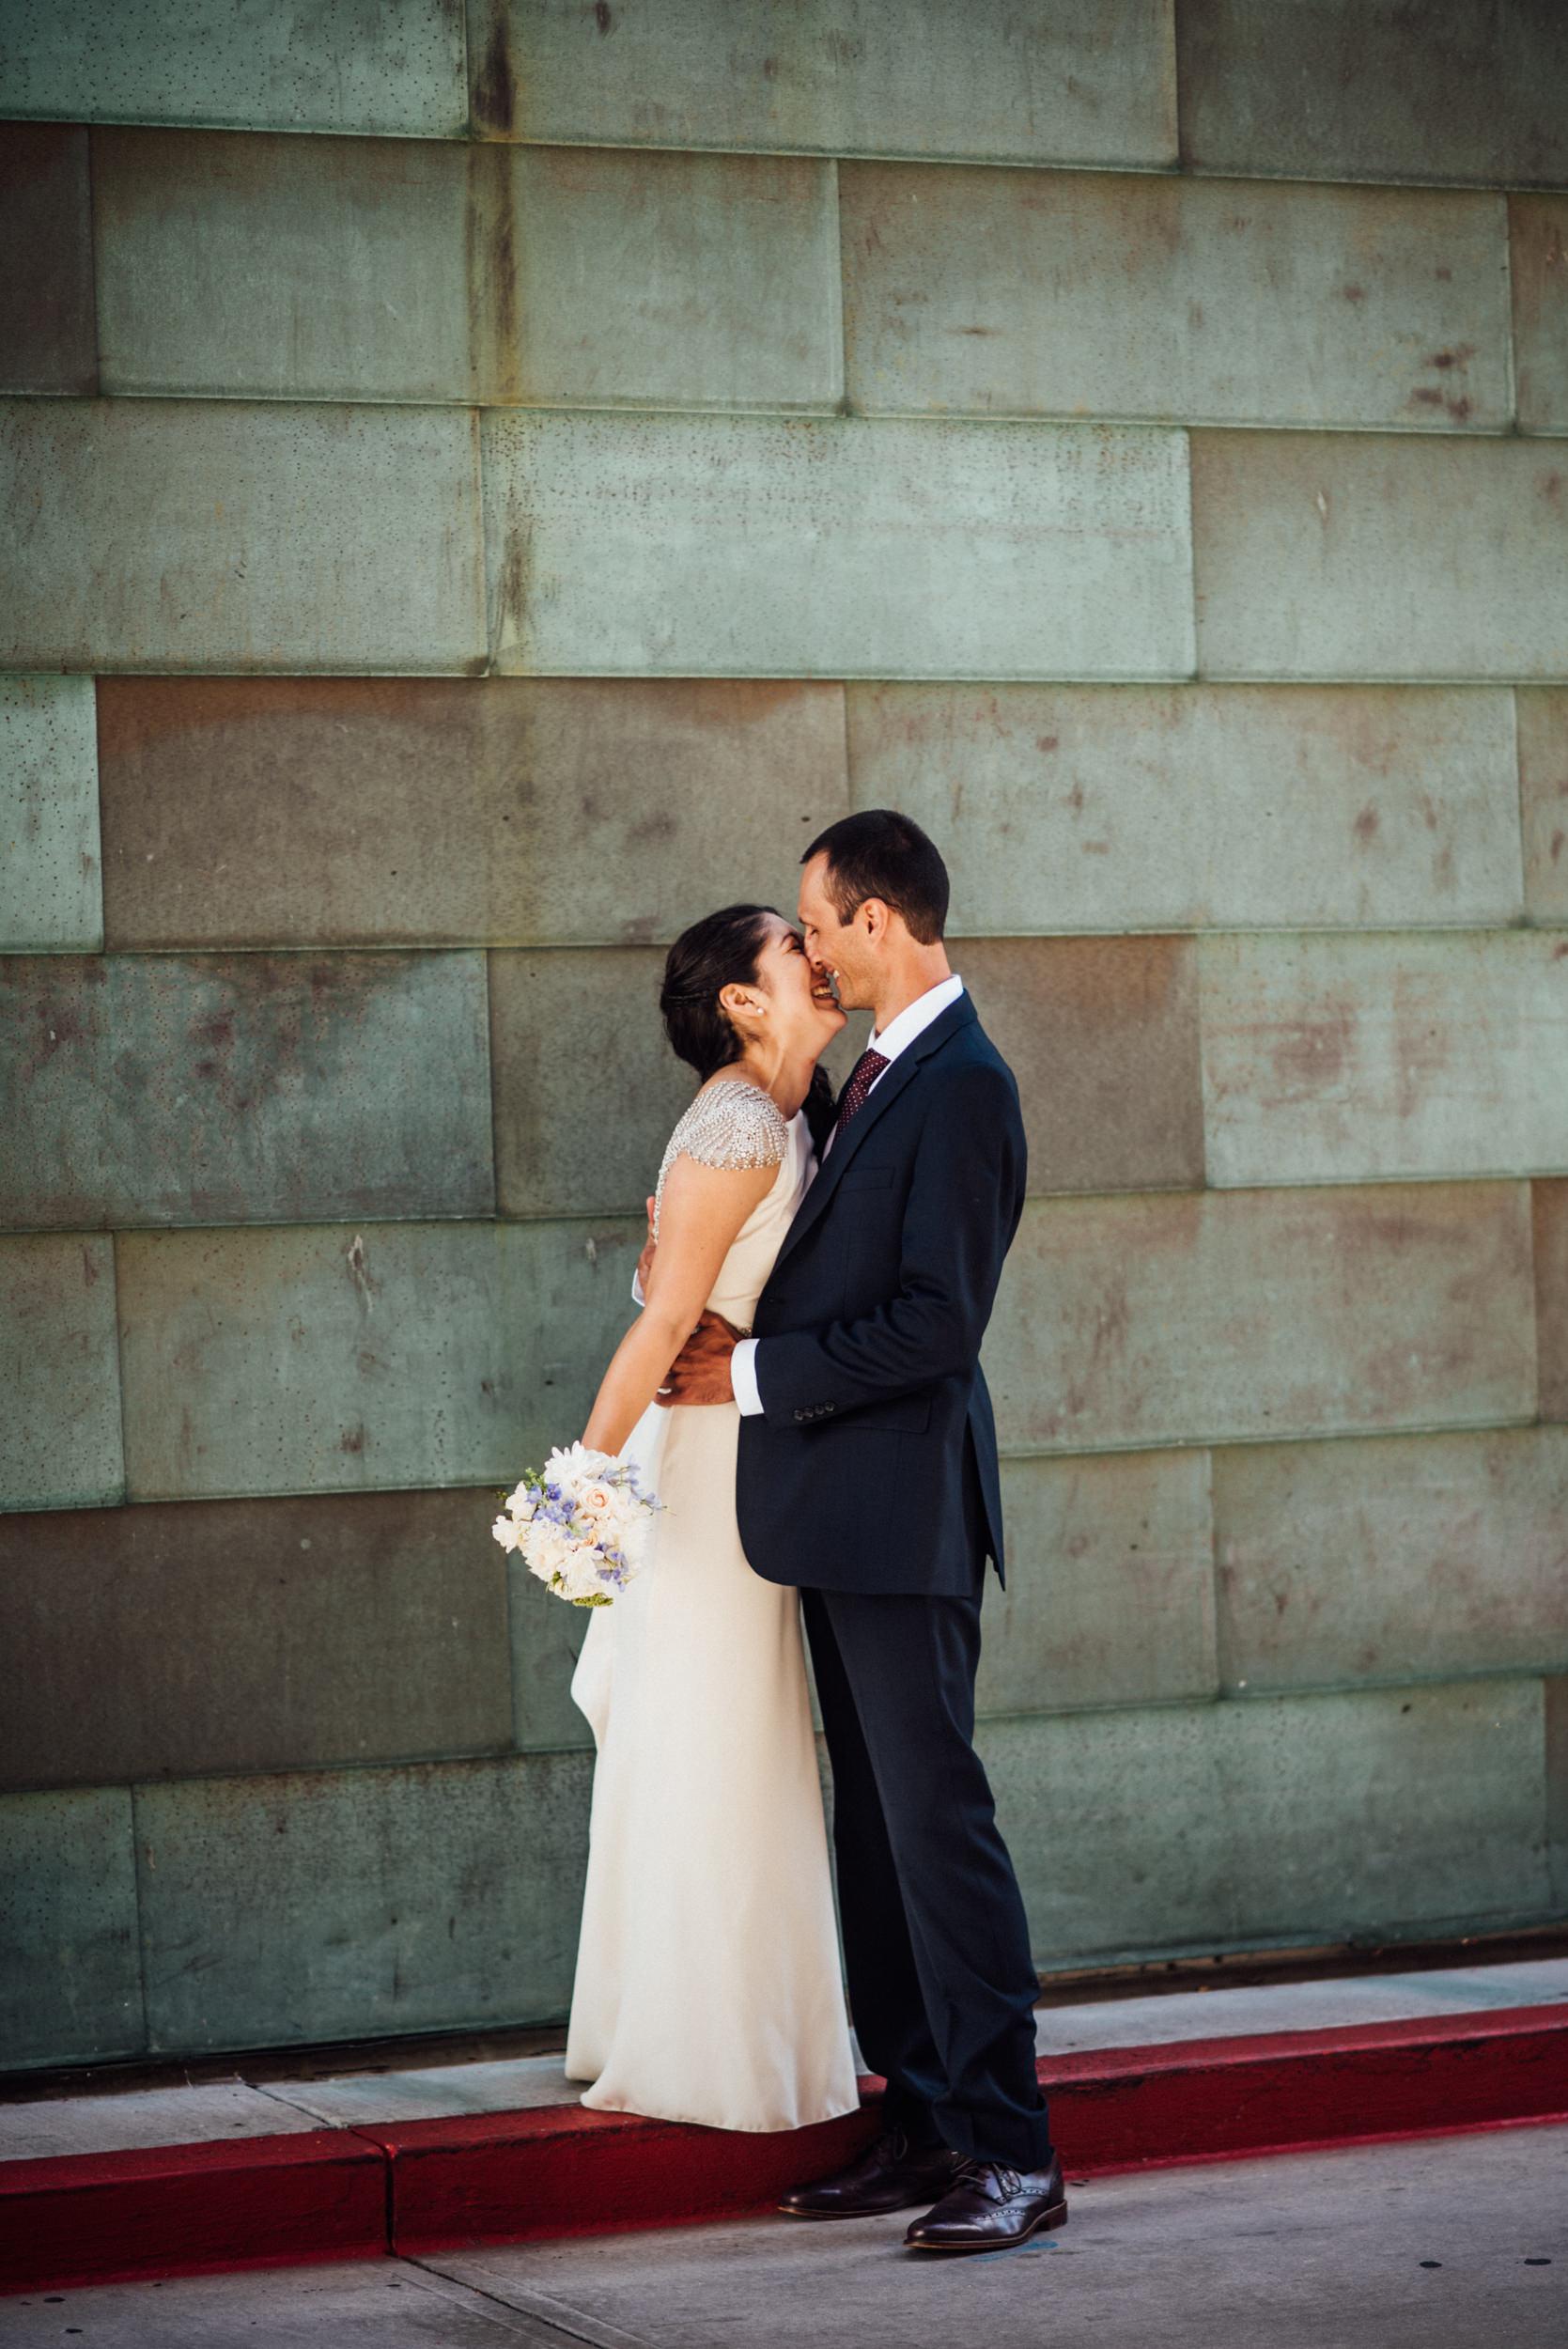 Colorado Denver Downtown Urban Wedding Colorado Wedding Photographer Bridal Portraits in LoDo